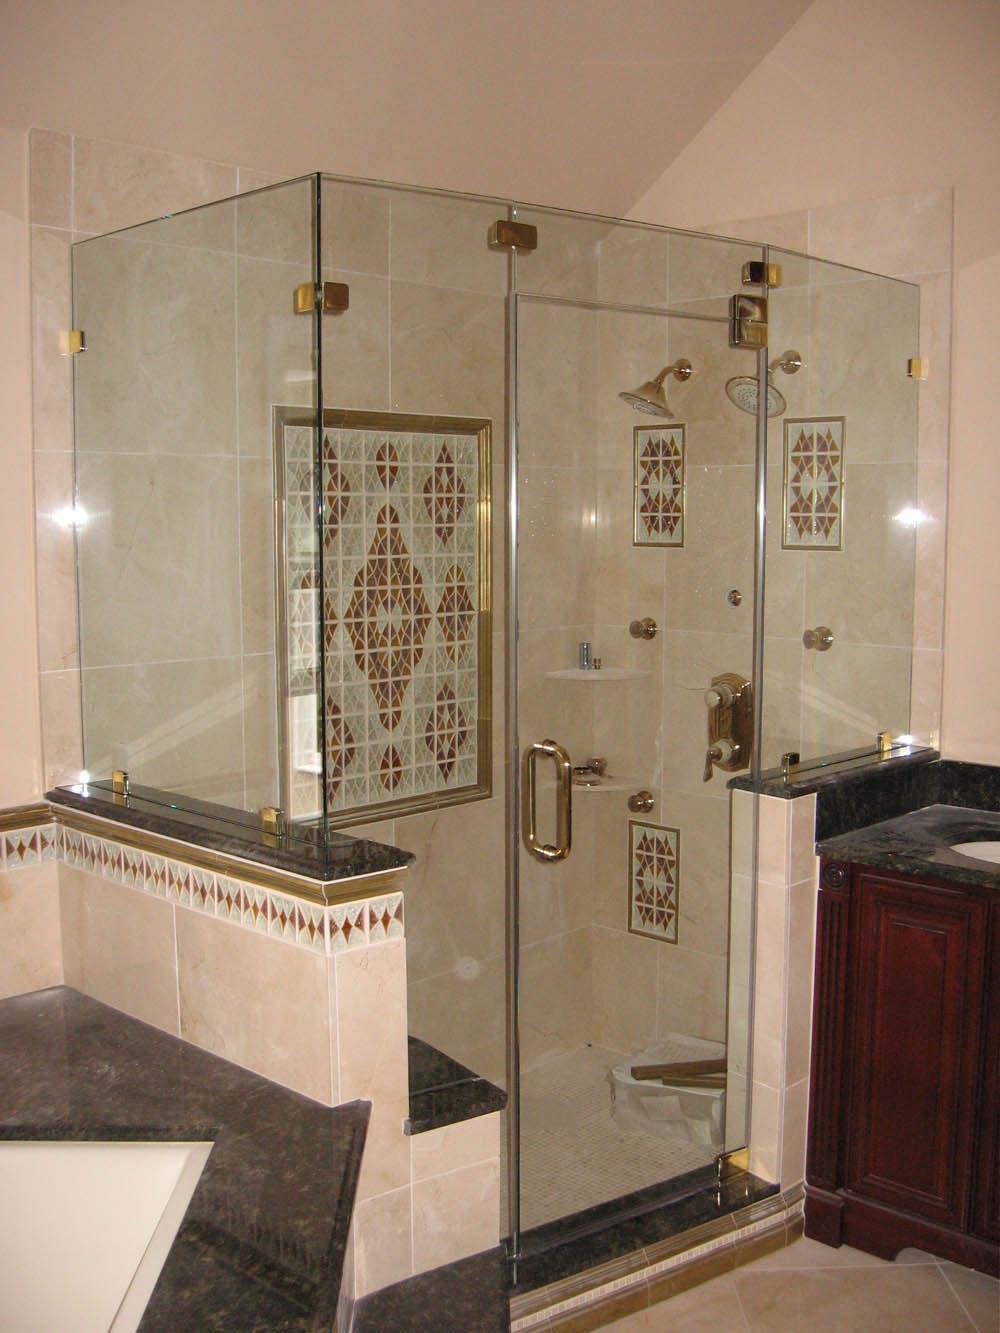 how much is kitchen cabinet installation modern pendant lights framed vs frameless glass shower doors options | ideas 4 homes